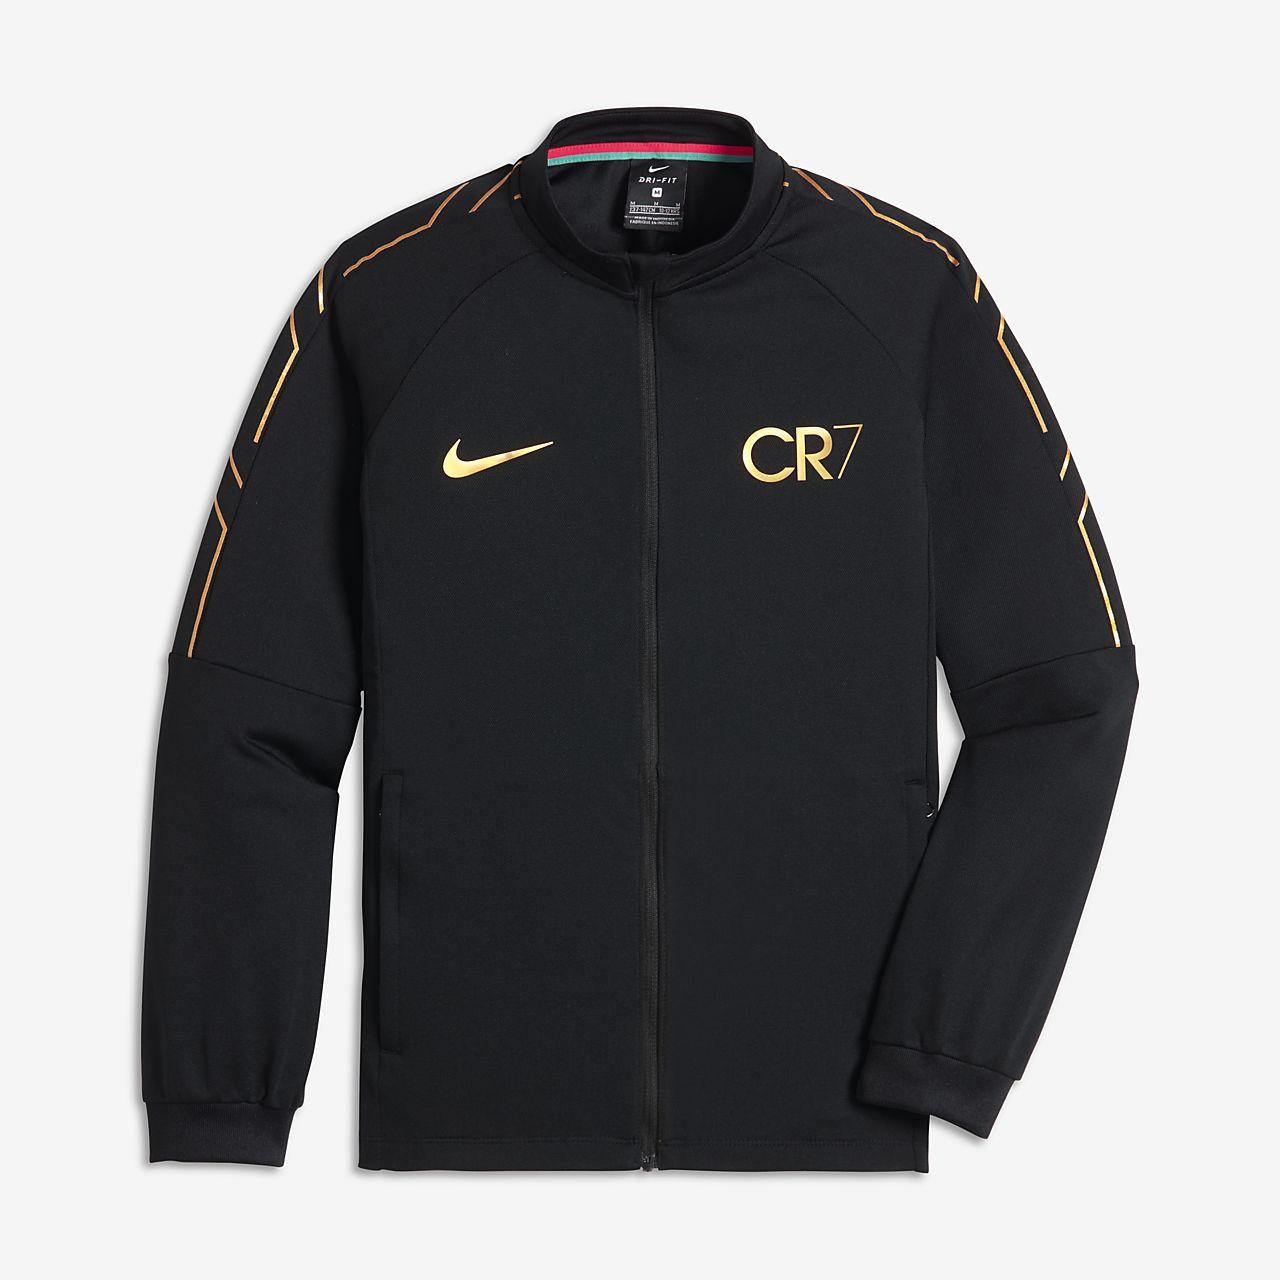 ... Nike Dri-FIT Academy CR7 Older Kids' (Boys') Track Suit